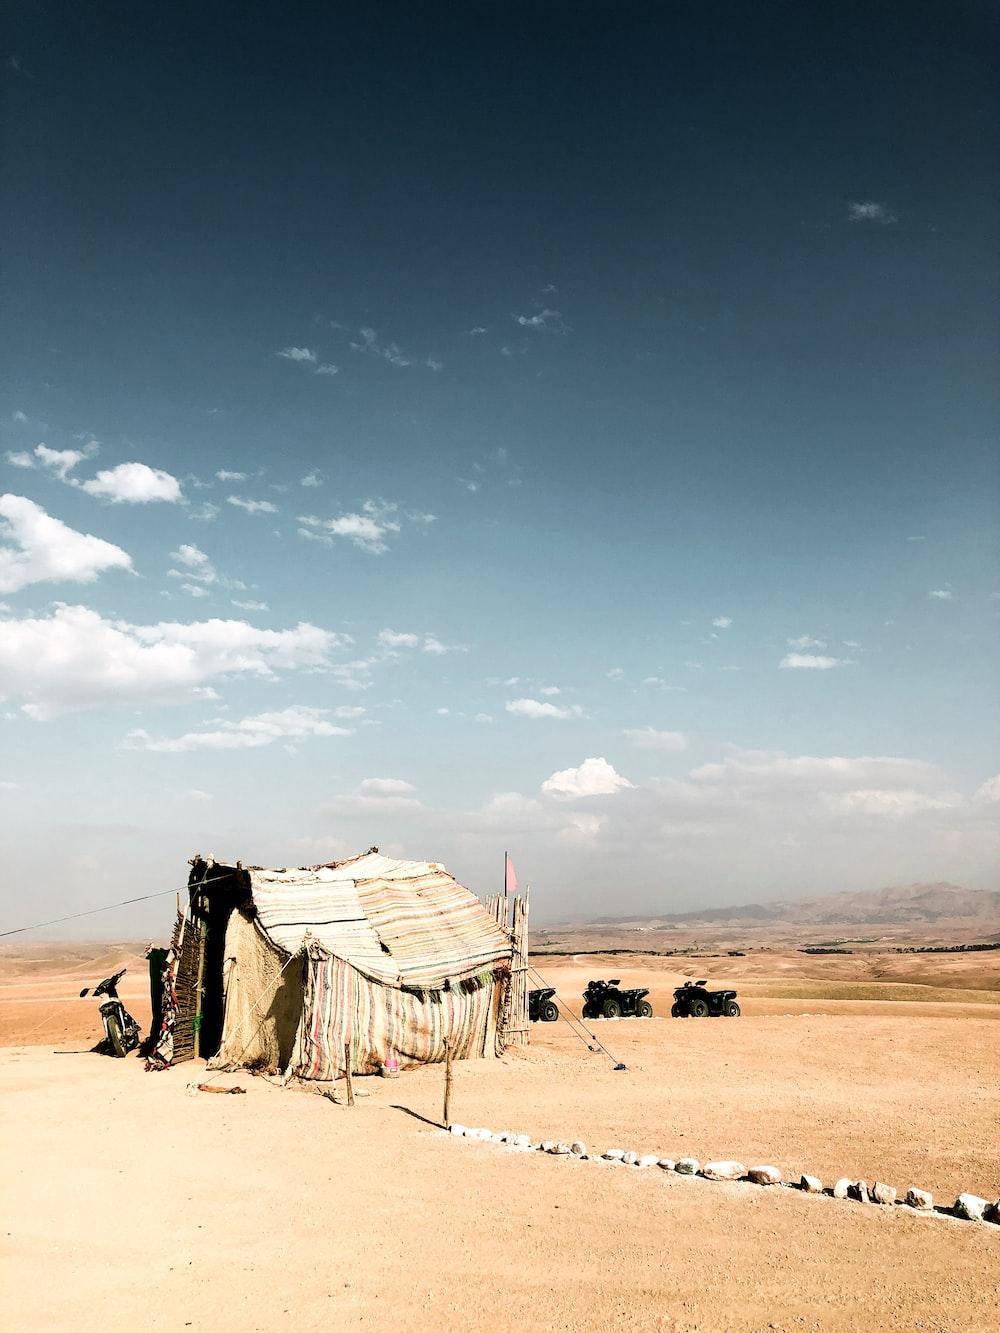 hut on dunes during daytime